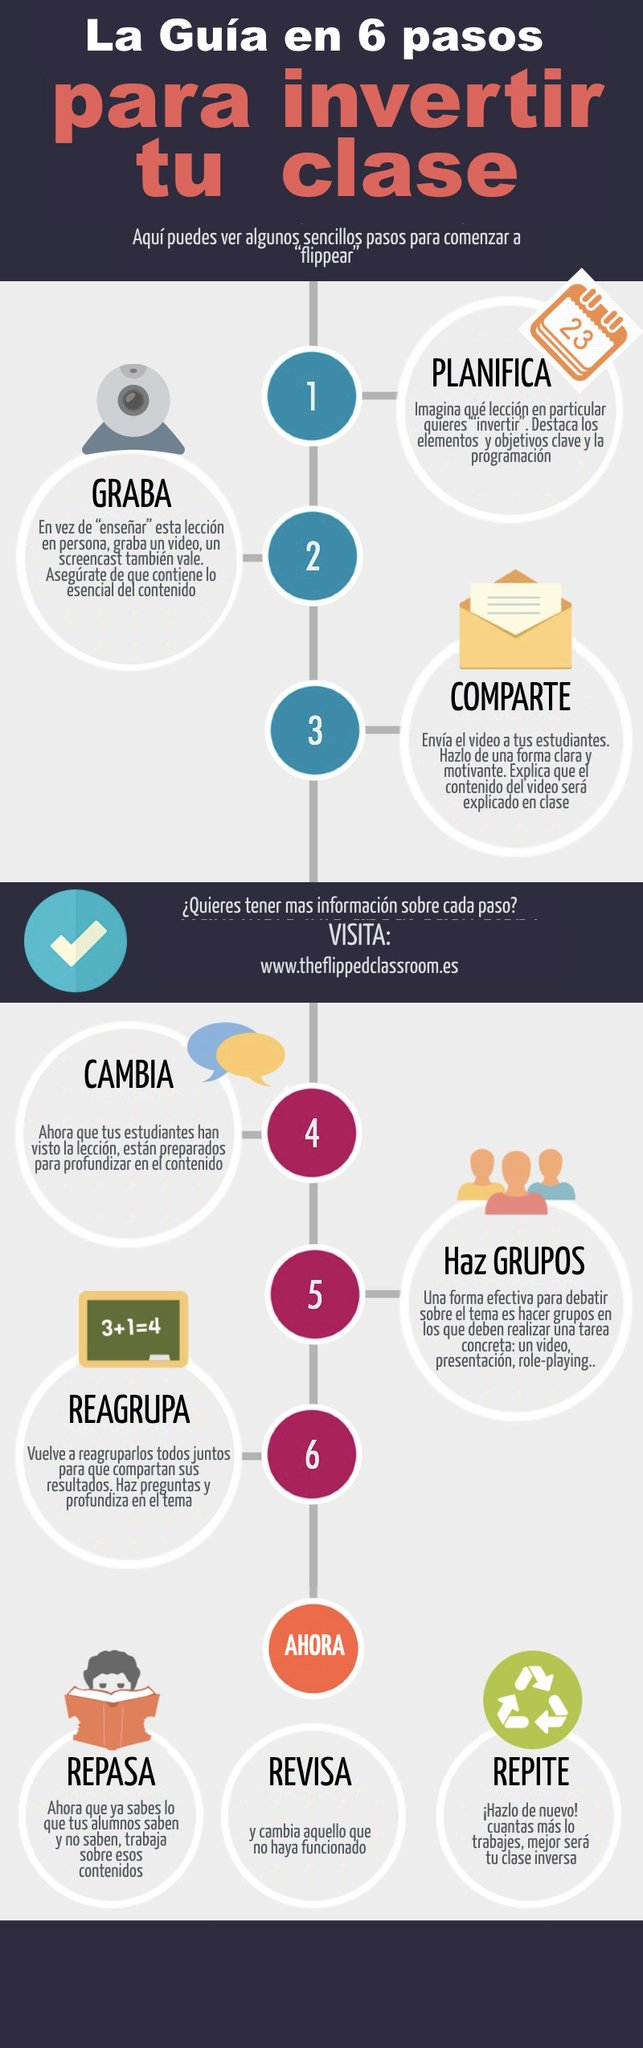 "Raul Santiago en Twitter: ""La Guía en 6 pasos para invertir tu clase #flippedCRIF #flipped_intef @HuescaCIFE https://t.co/u4iyRYAXW5"""